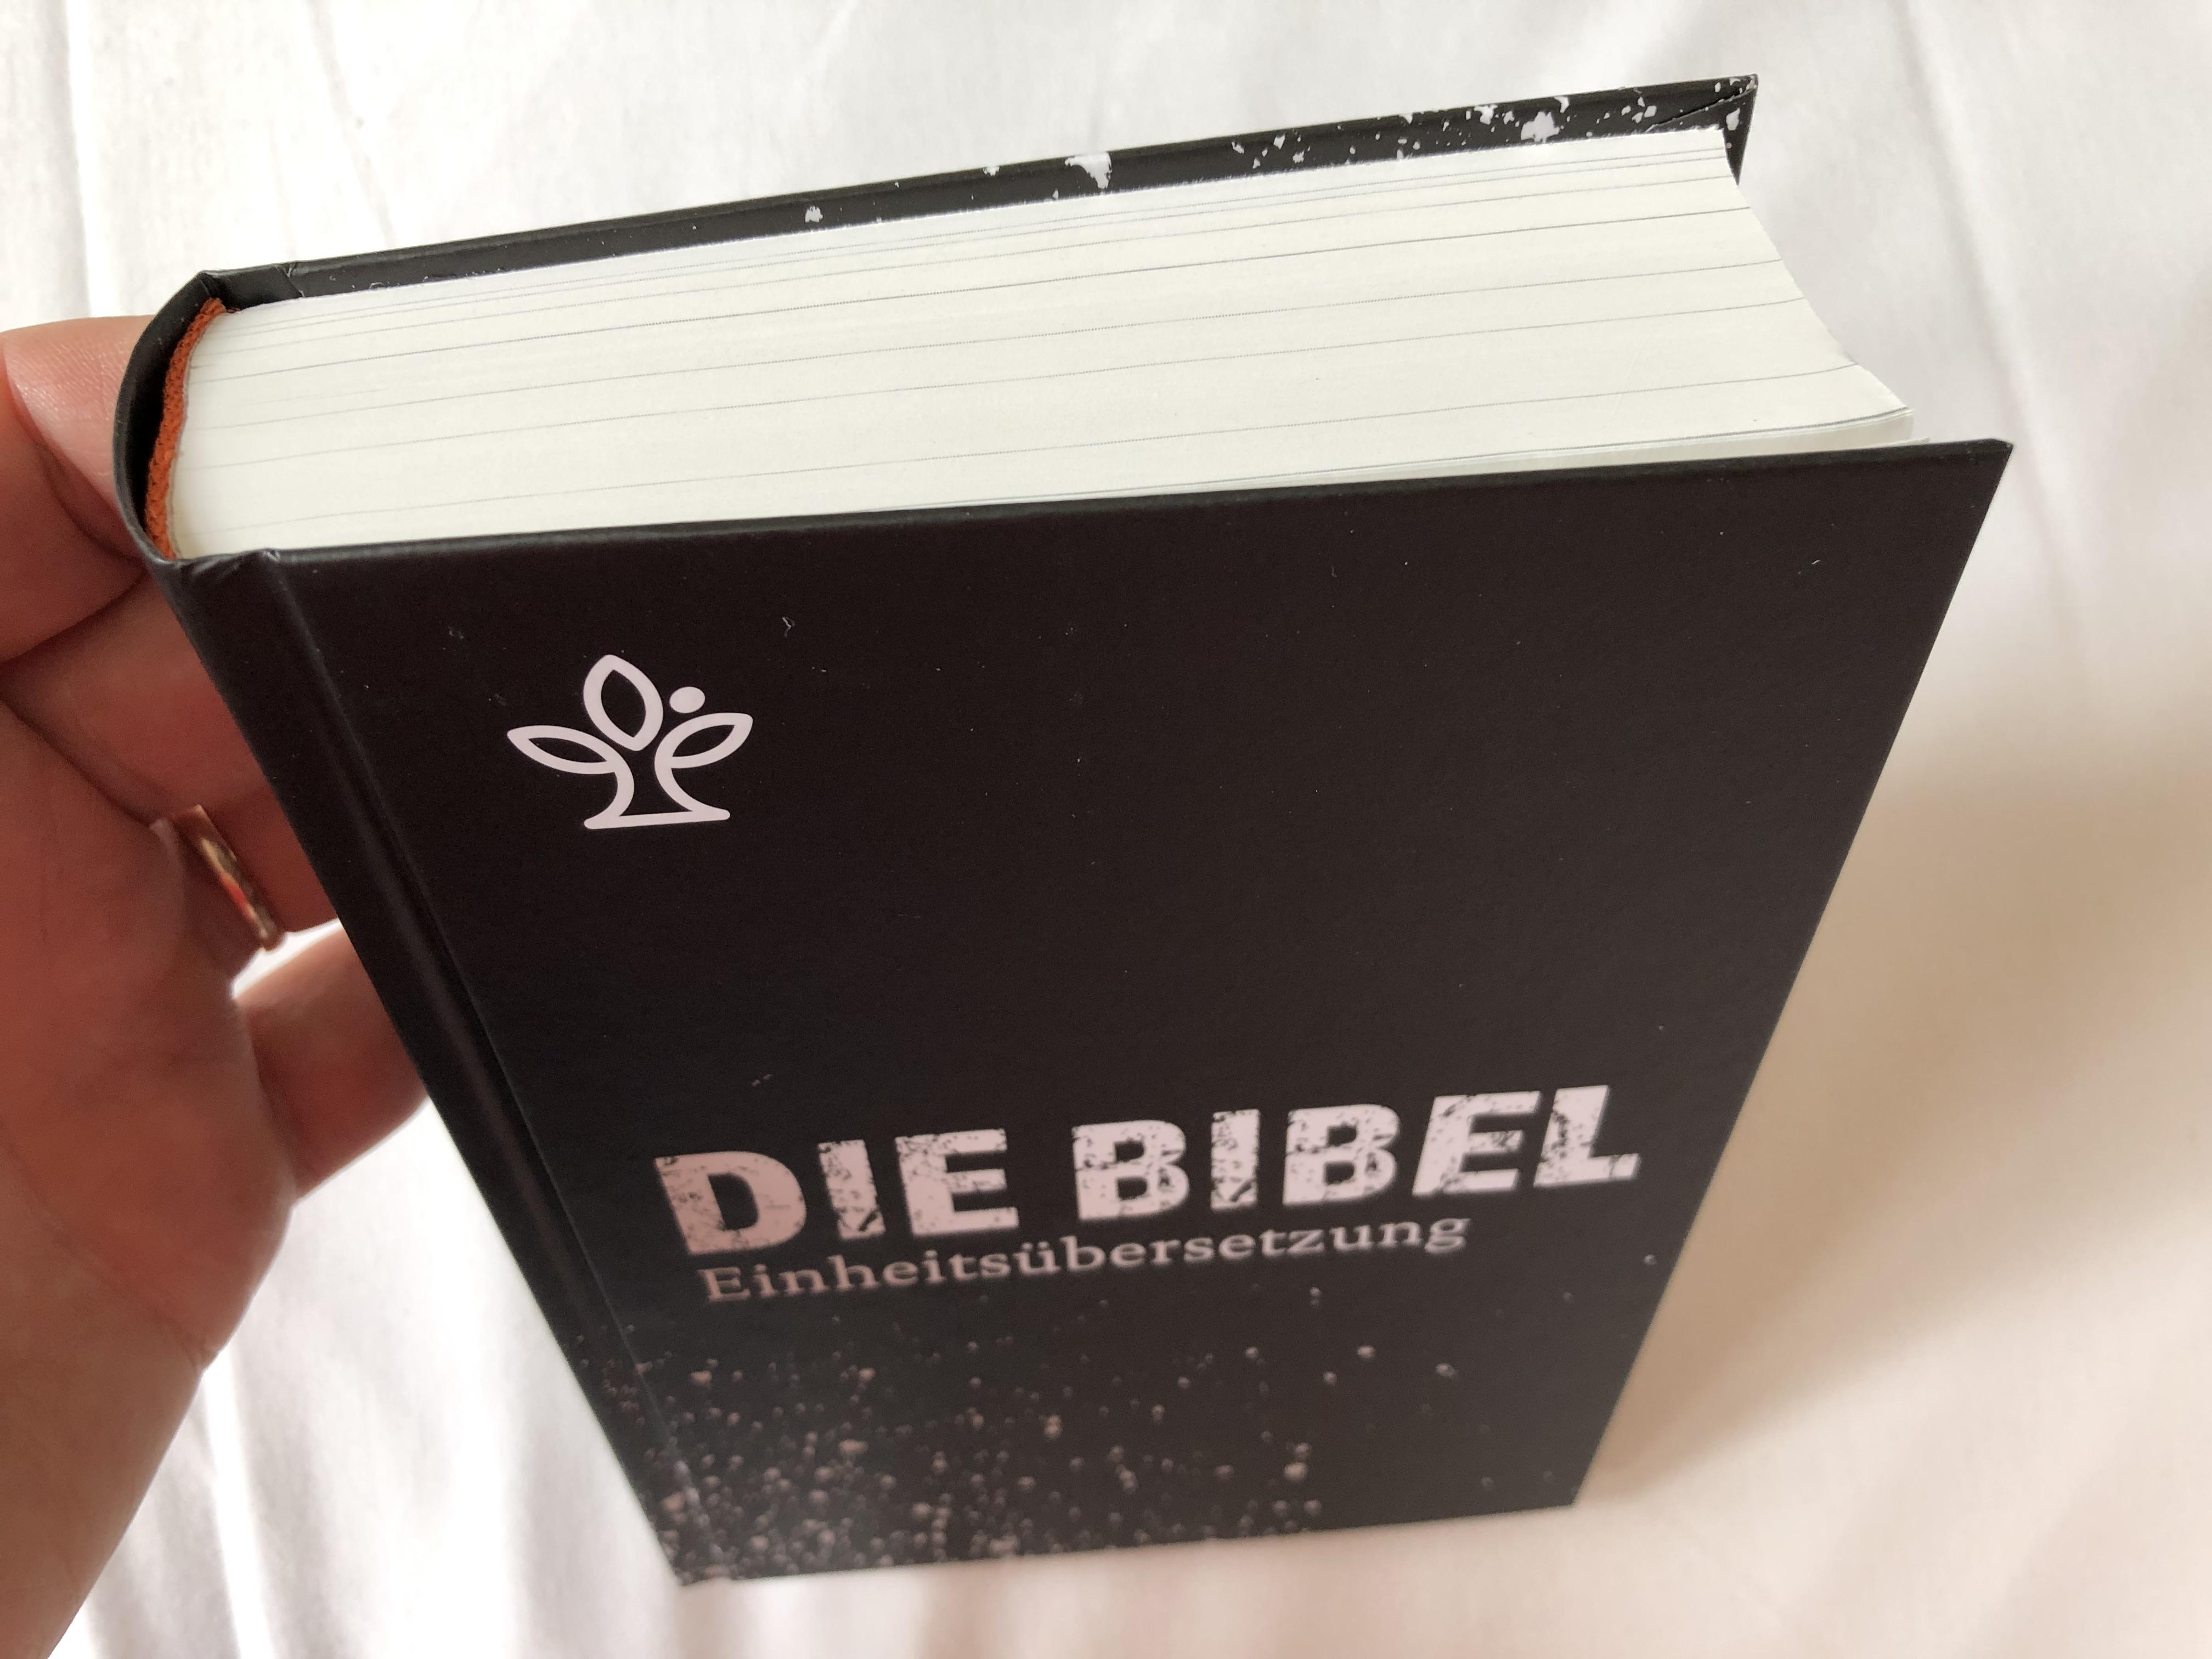 die-bibel-einheits-bersetzung-german-language-holy-bible-unitary-translation-contains-deuterocanonical-books-apocrypha-hardcover-2016-kbw-3-.jpg